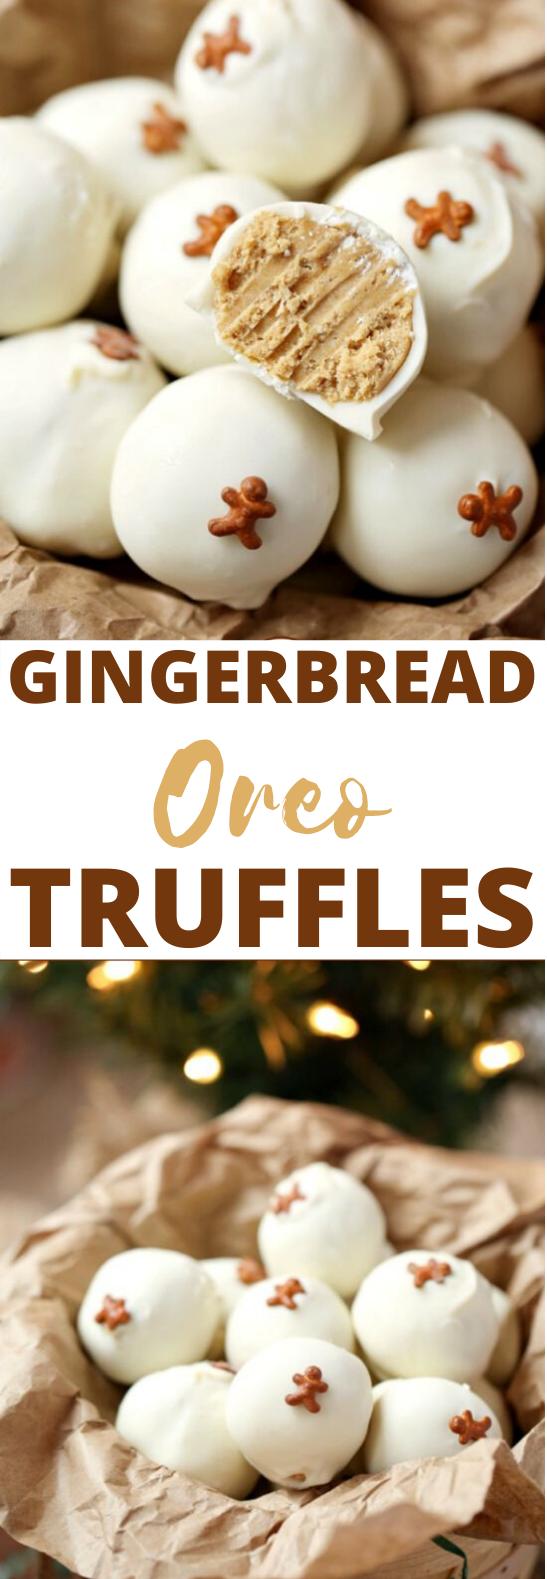 Gingerbread Oreo Truffles #desserts #nobake #christmas #gifts #thanksgiving